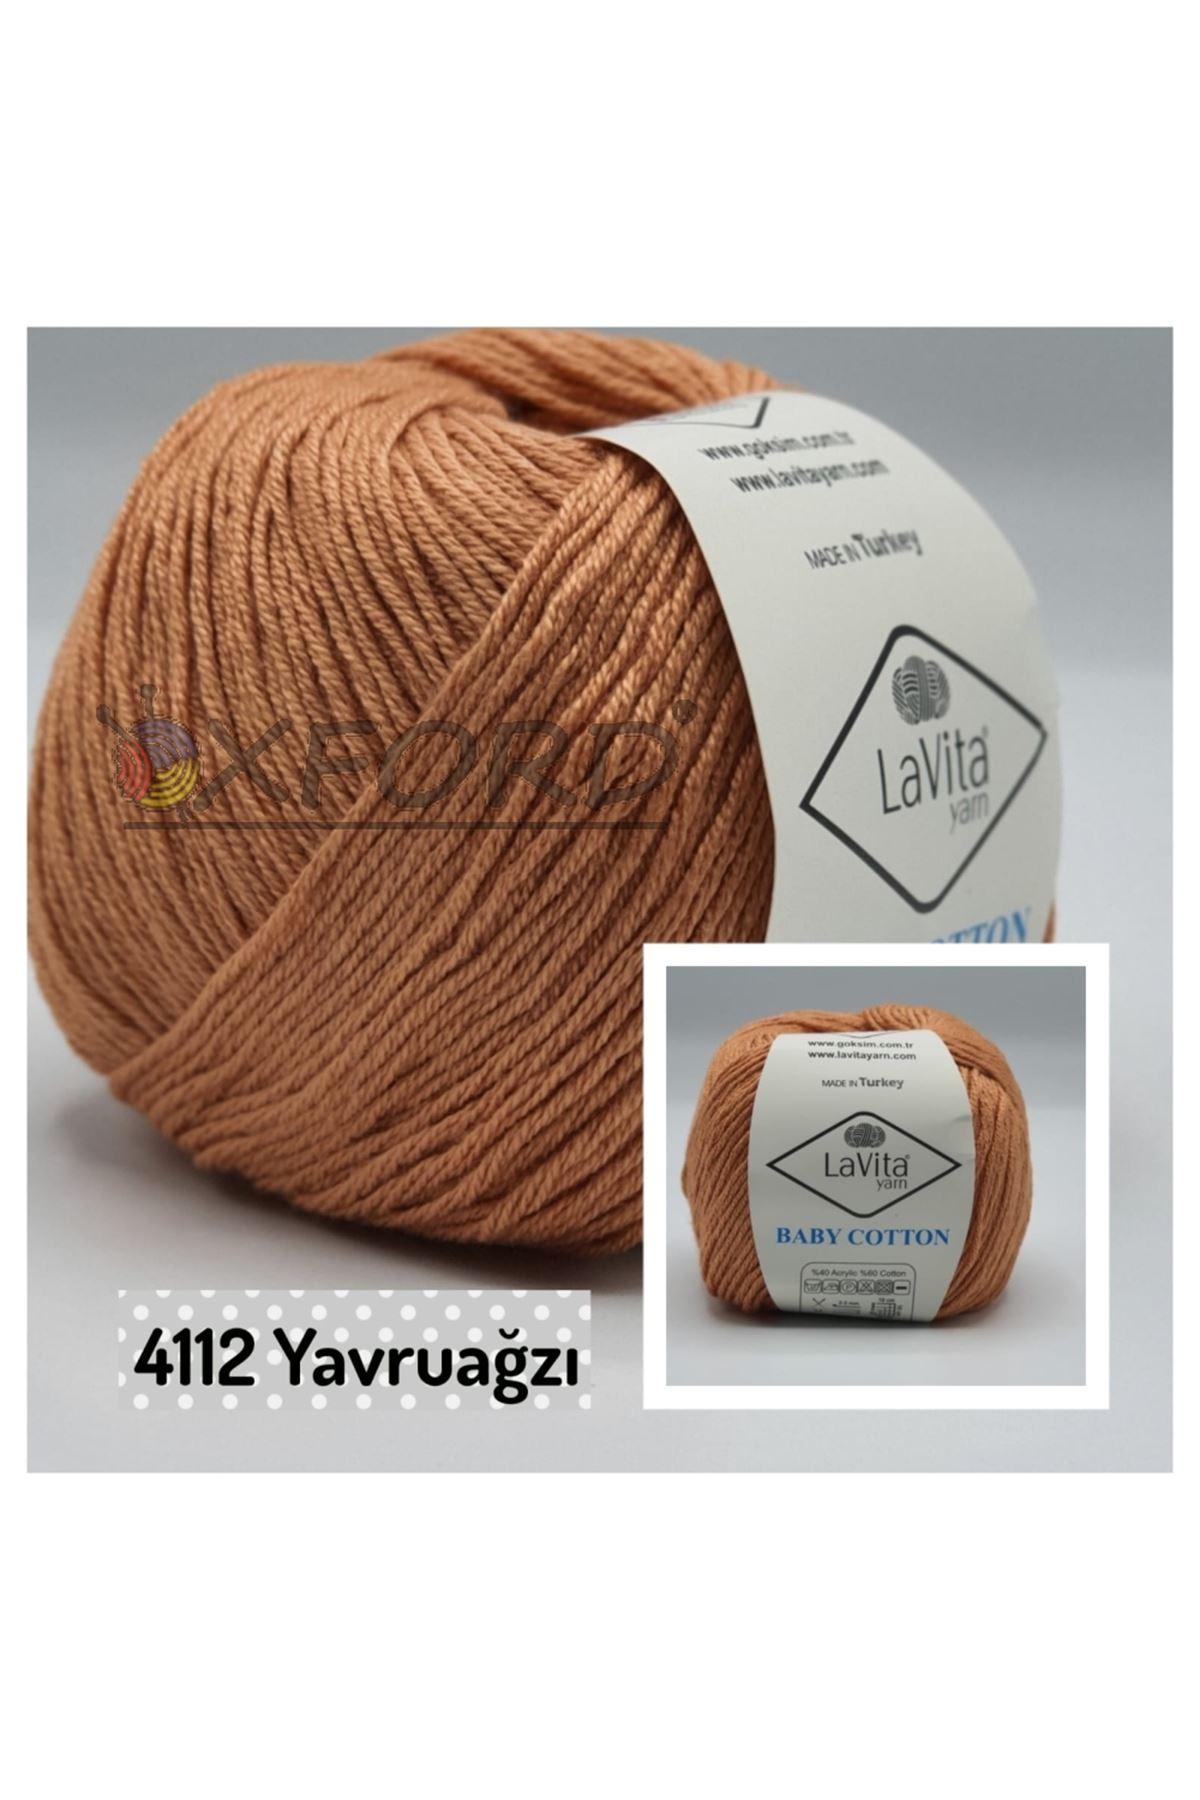 Lavita Baby Cotton 4112 Yavruağzı